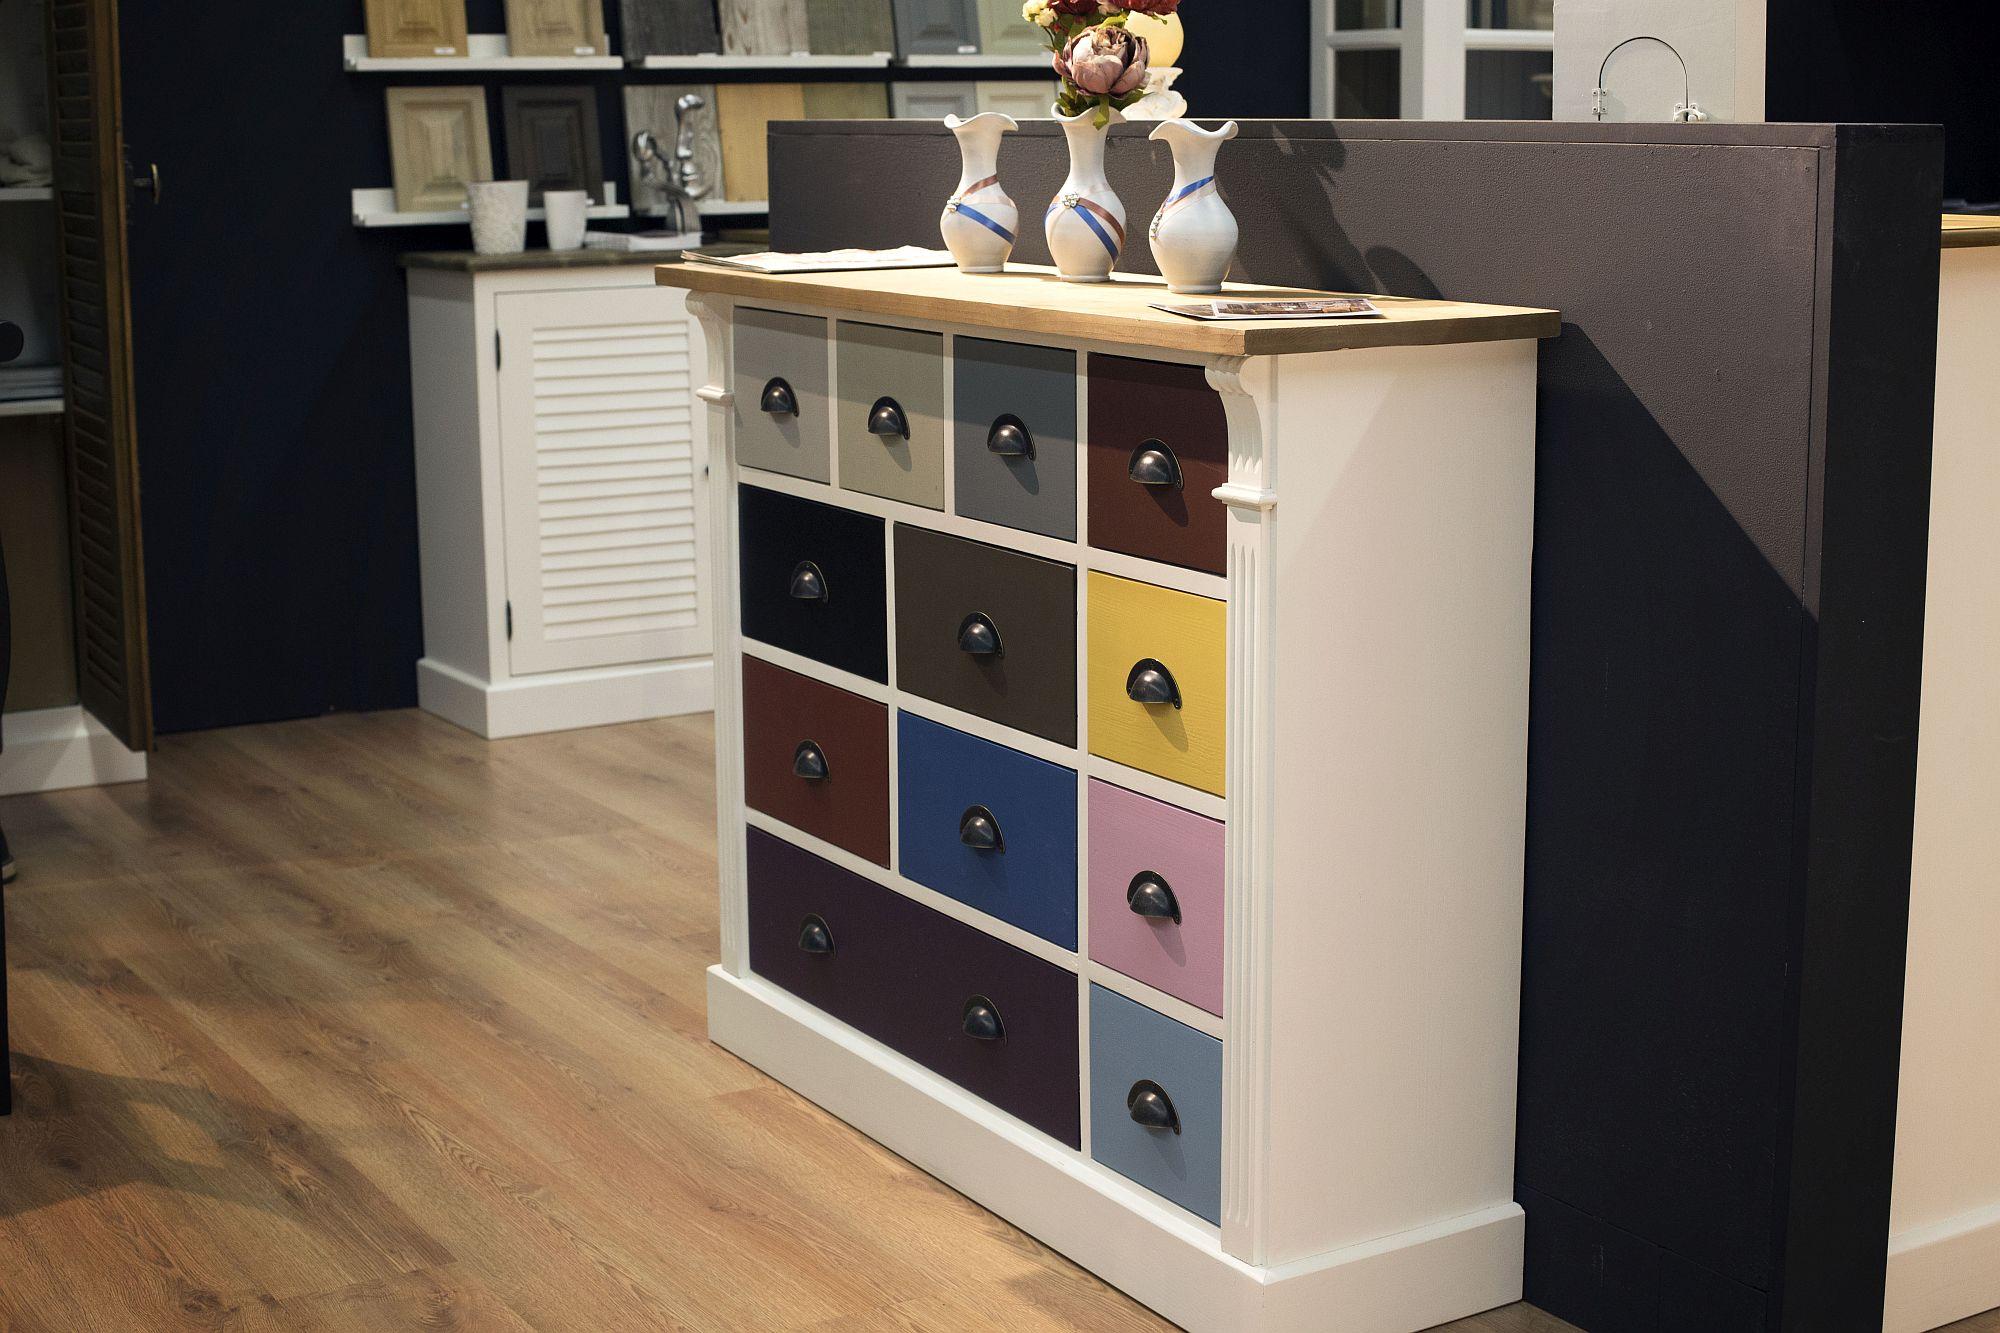 Colorful blocks bring brightness to the sleek storage unit